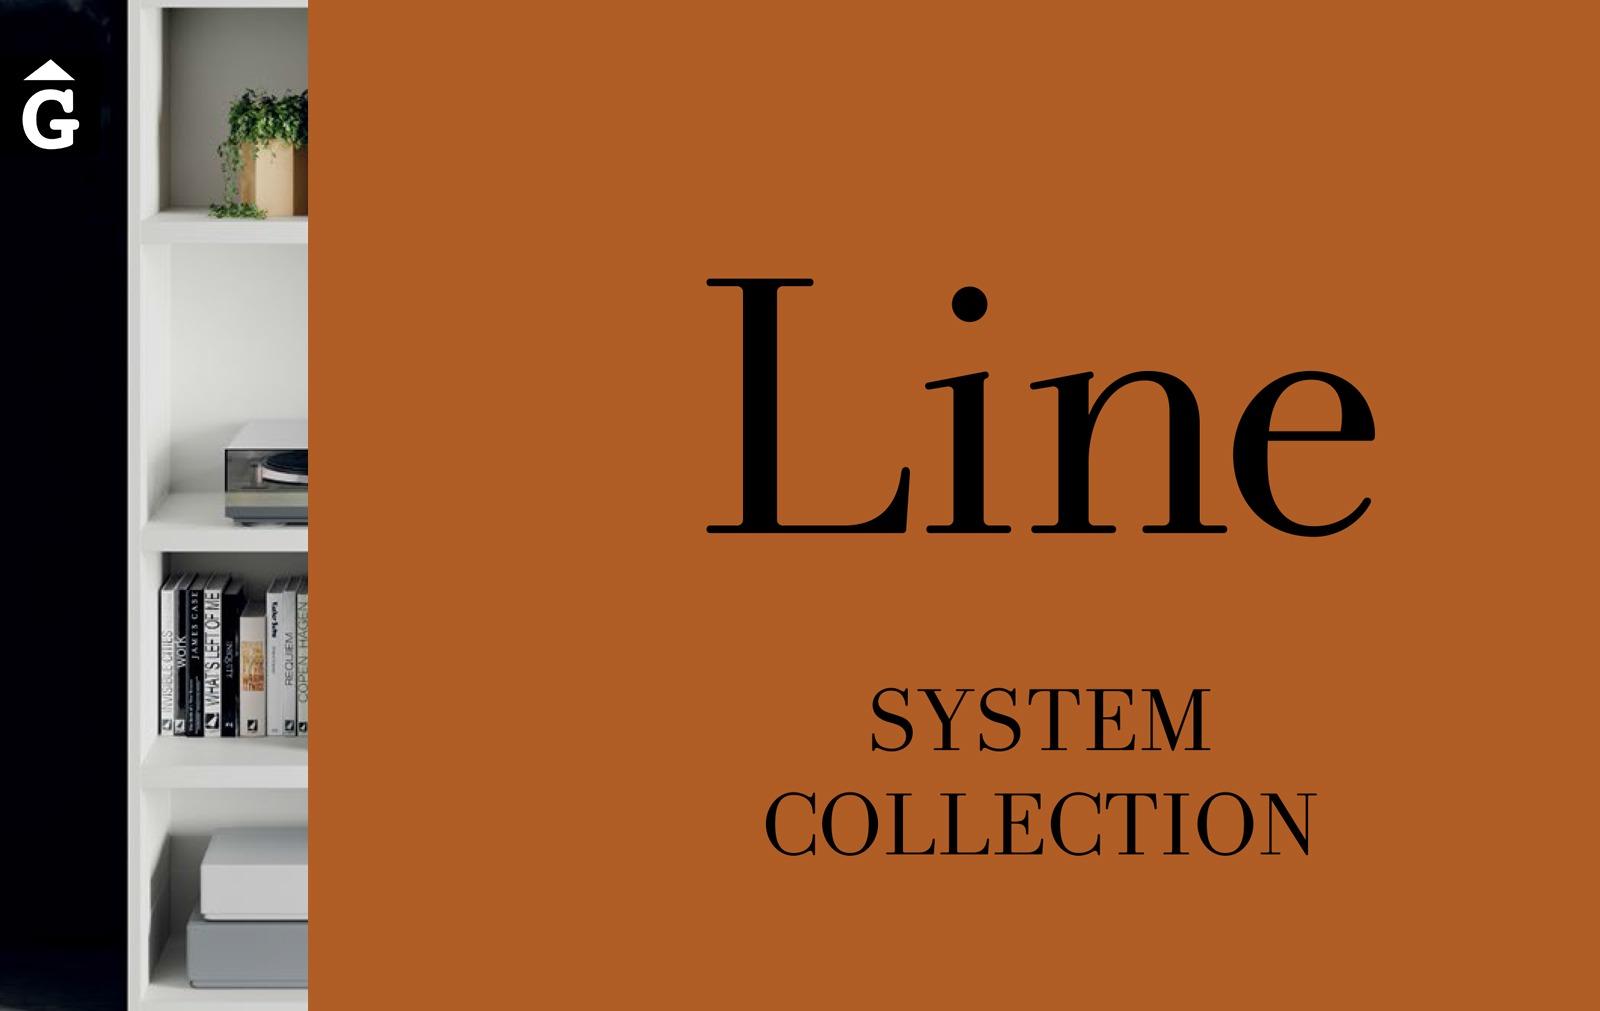 Line ViVe logo muebles Verge programa llibrera llibreries living by mobles Gifreu